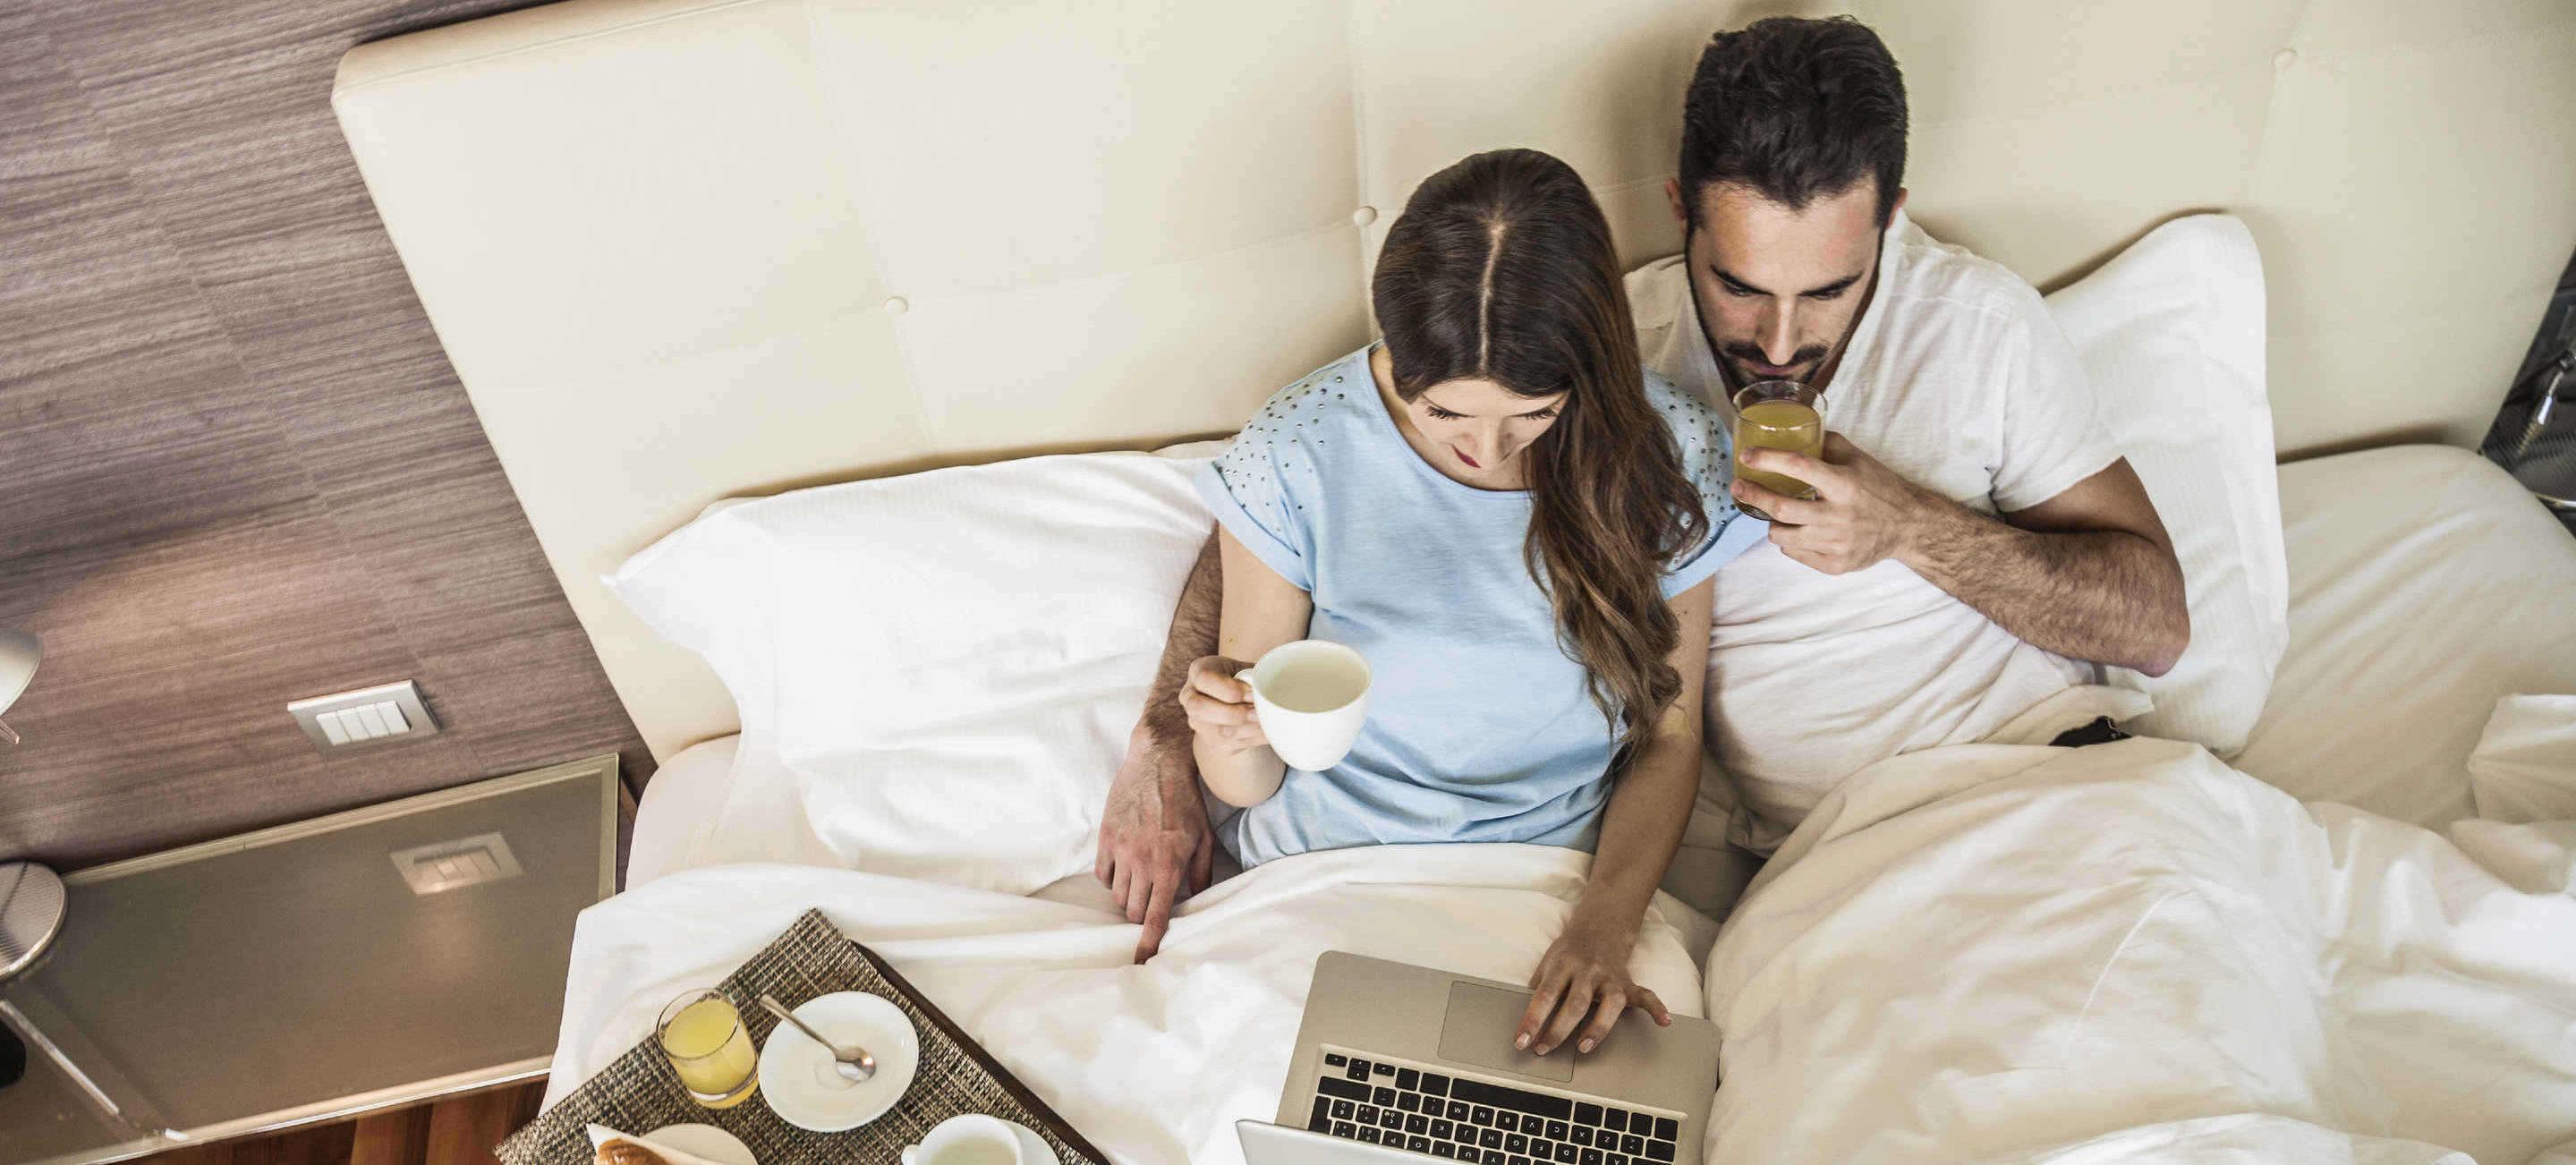 kulta Diggers dating site UK